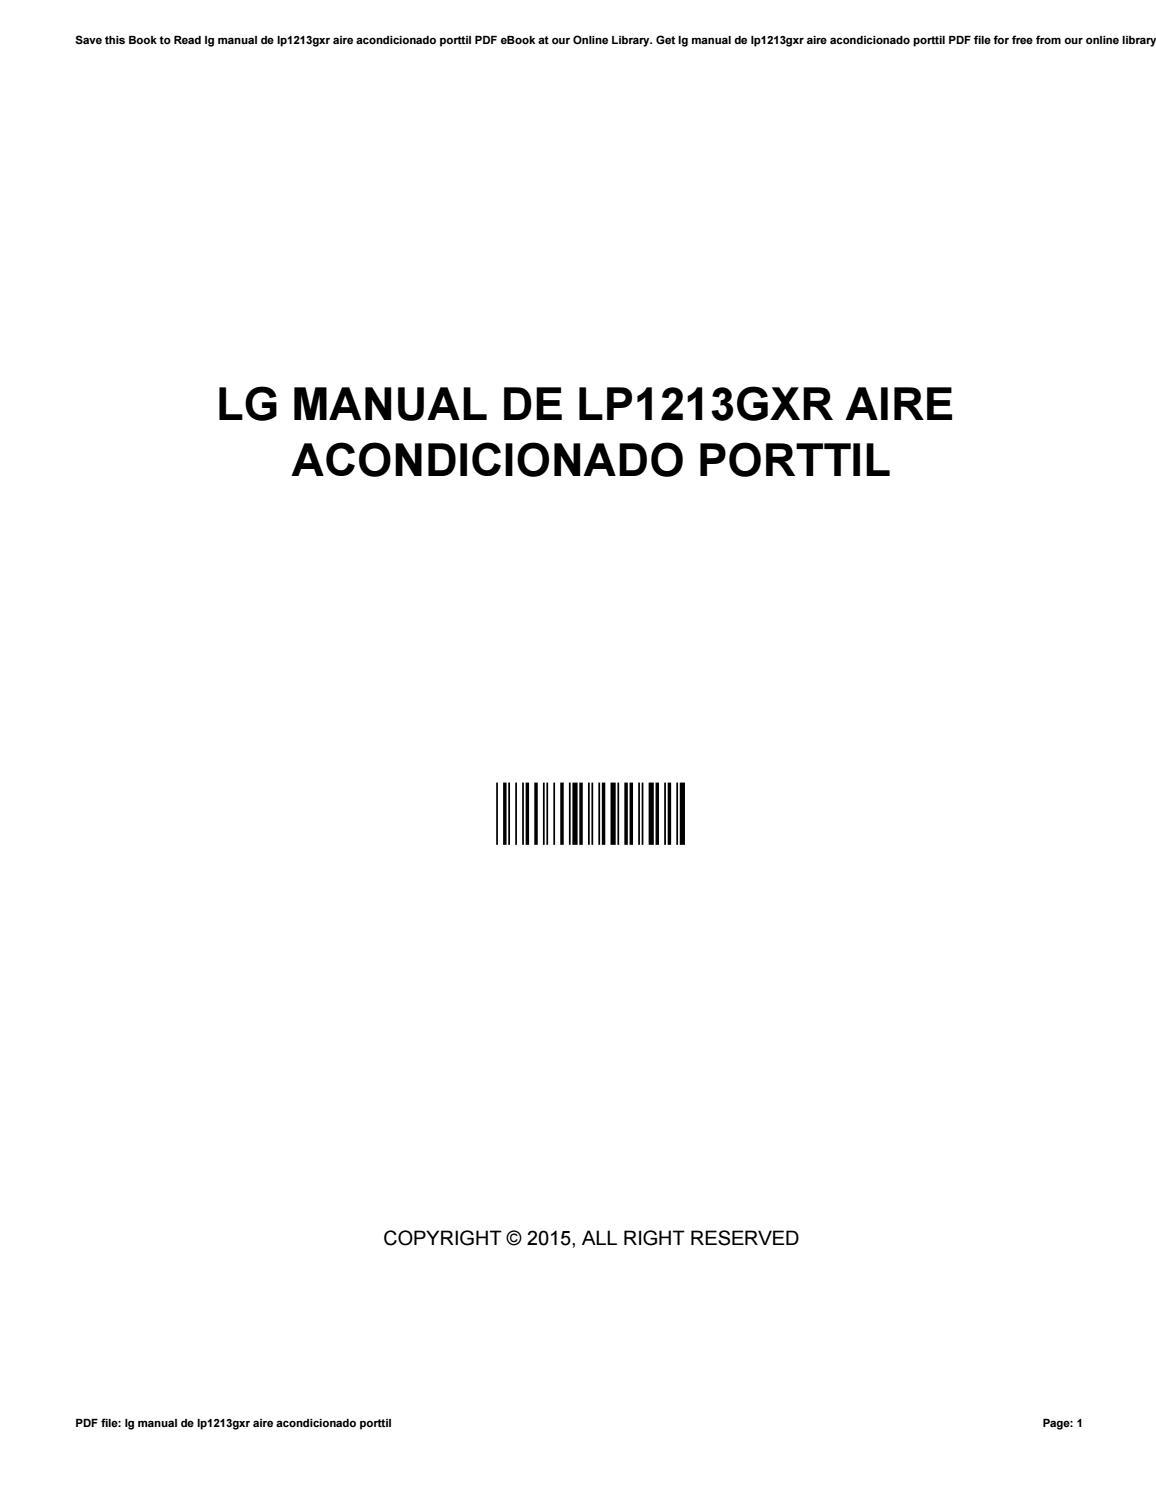 hight resolution of  array lg manual de lp1213gxr aire acondicionado porttil by jamiegorman3869 rh issuu com